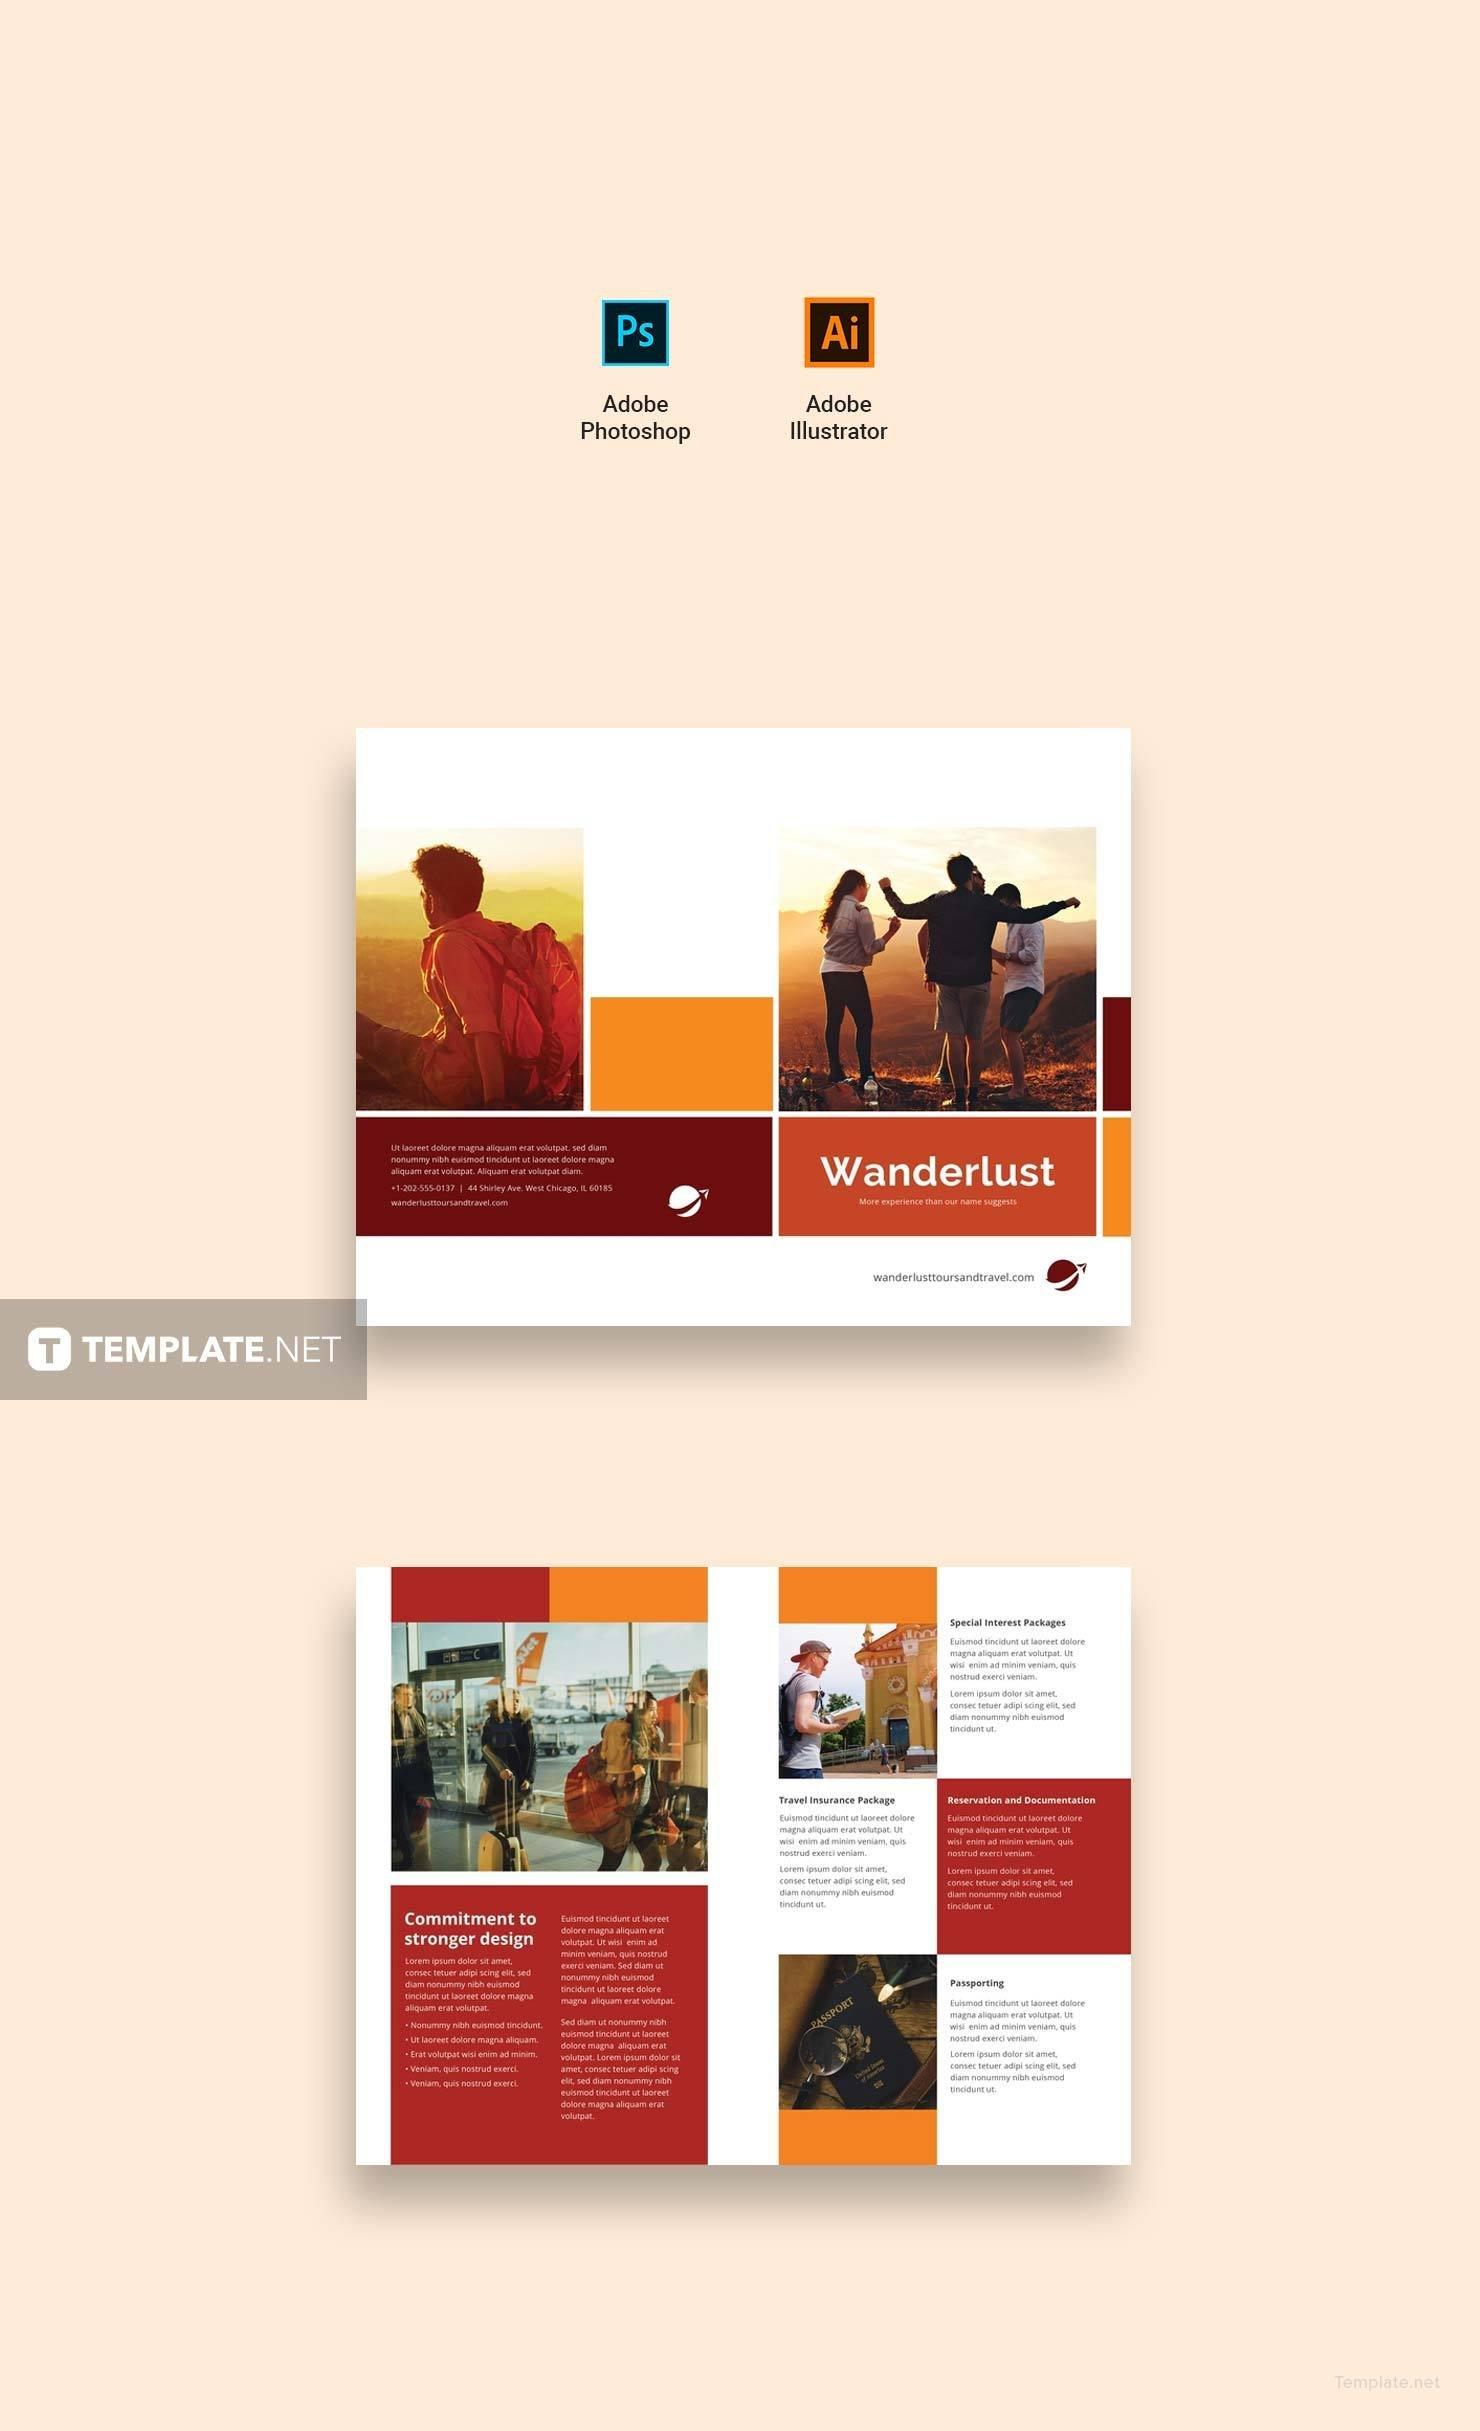 Free Service Catalog Template in Adobe Photoshop, Illustrator ...